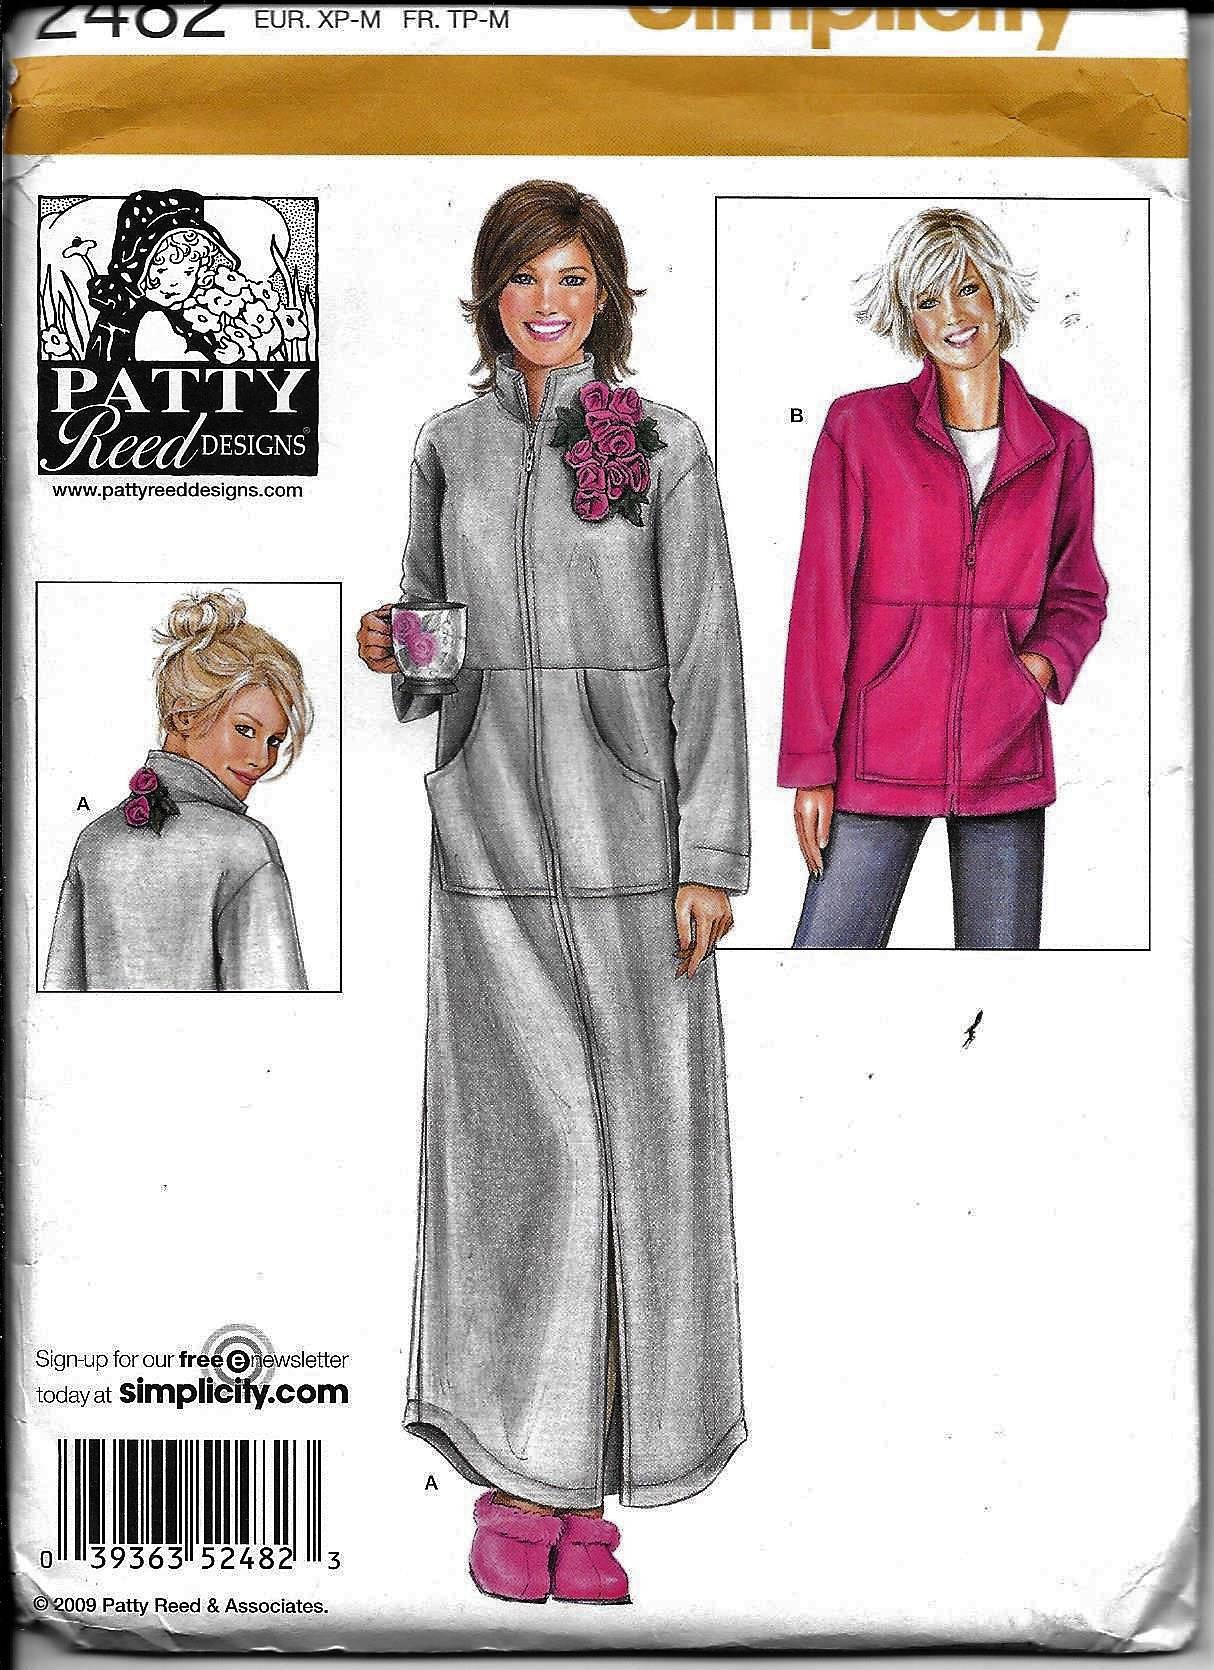 3a76dfa5e8 Simplicity Pattern 2482 Patty Reed Loungewear Misses Robe